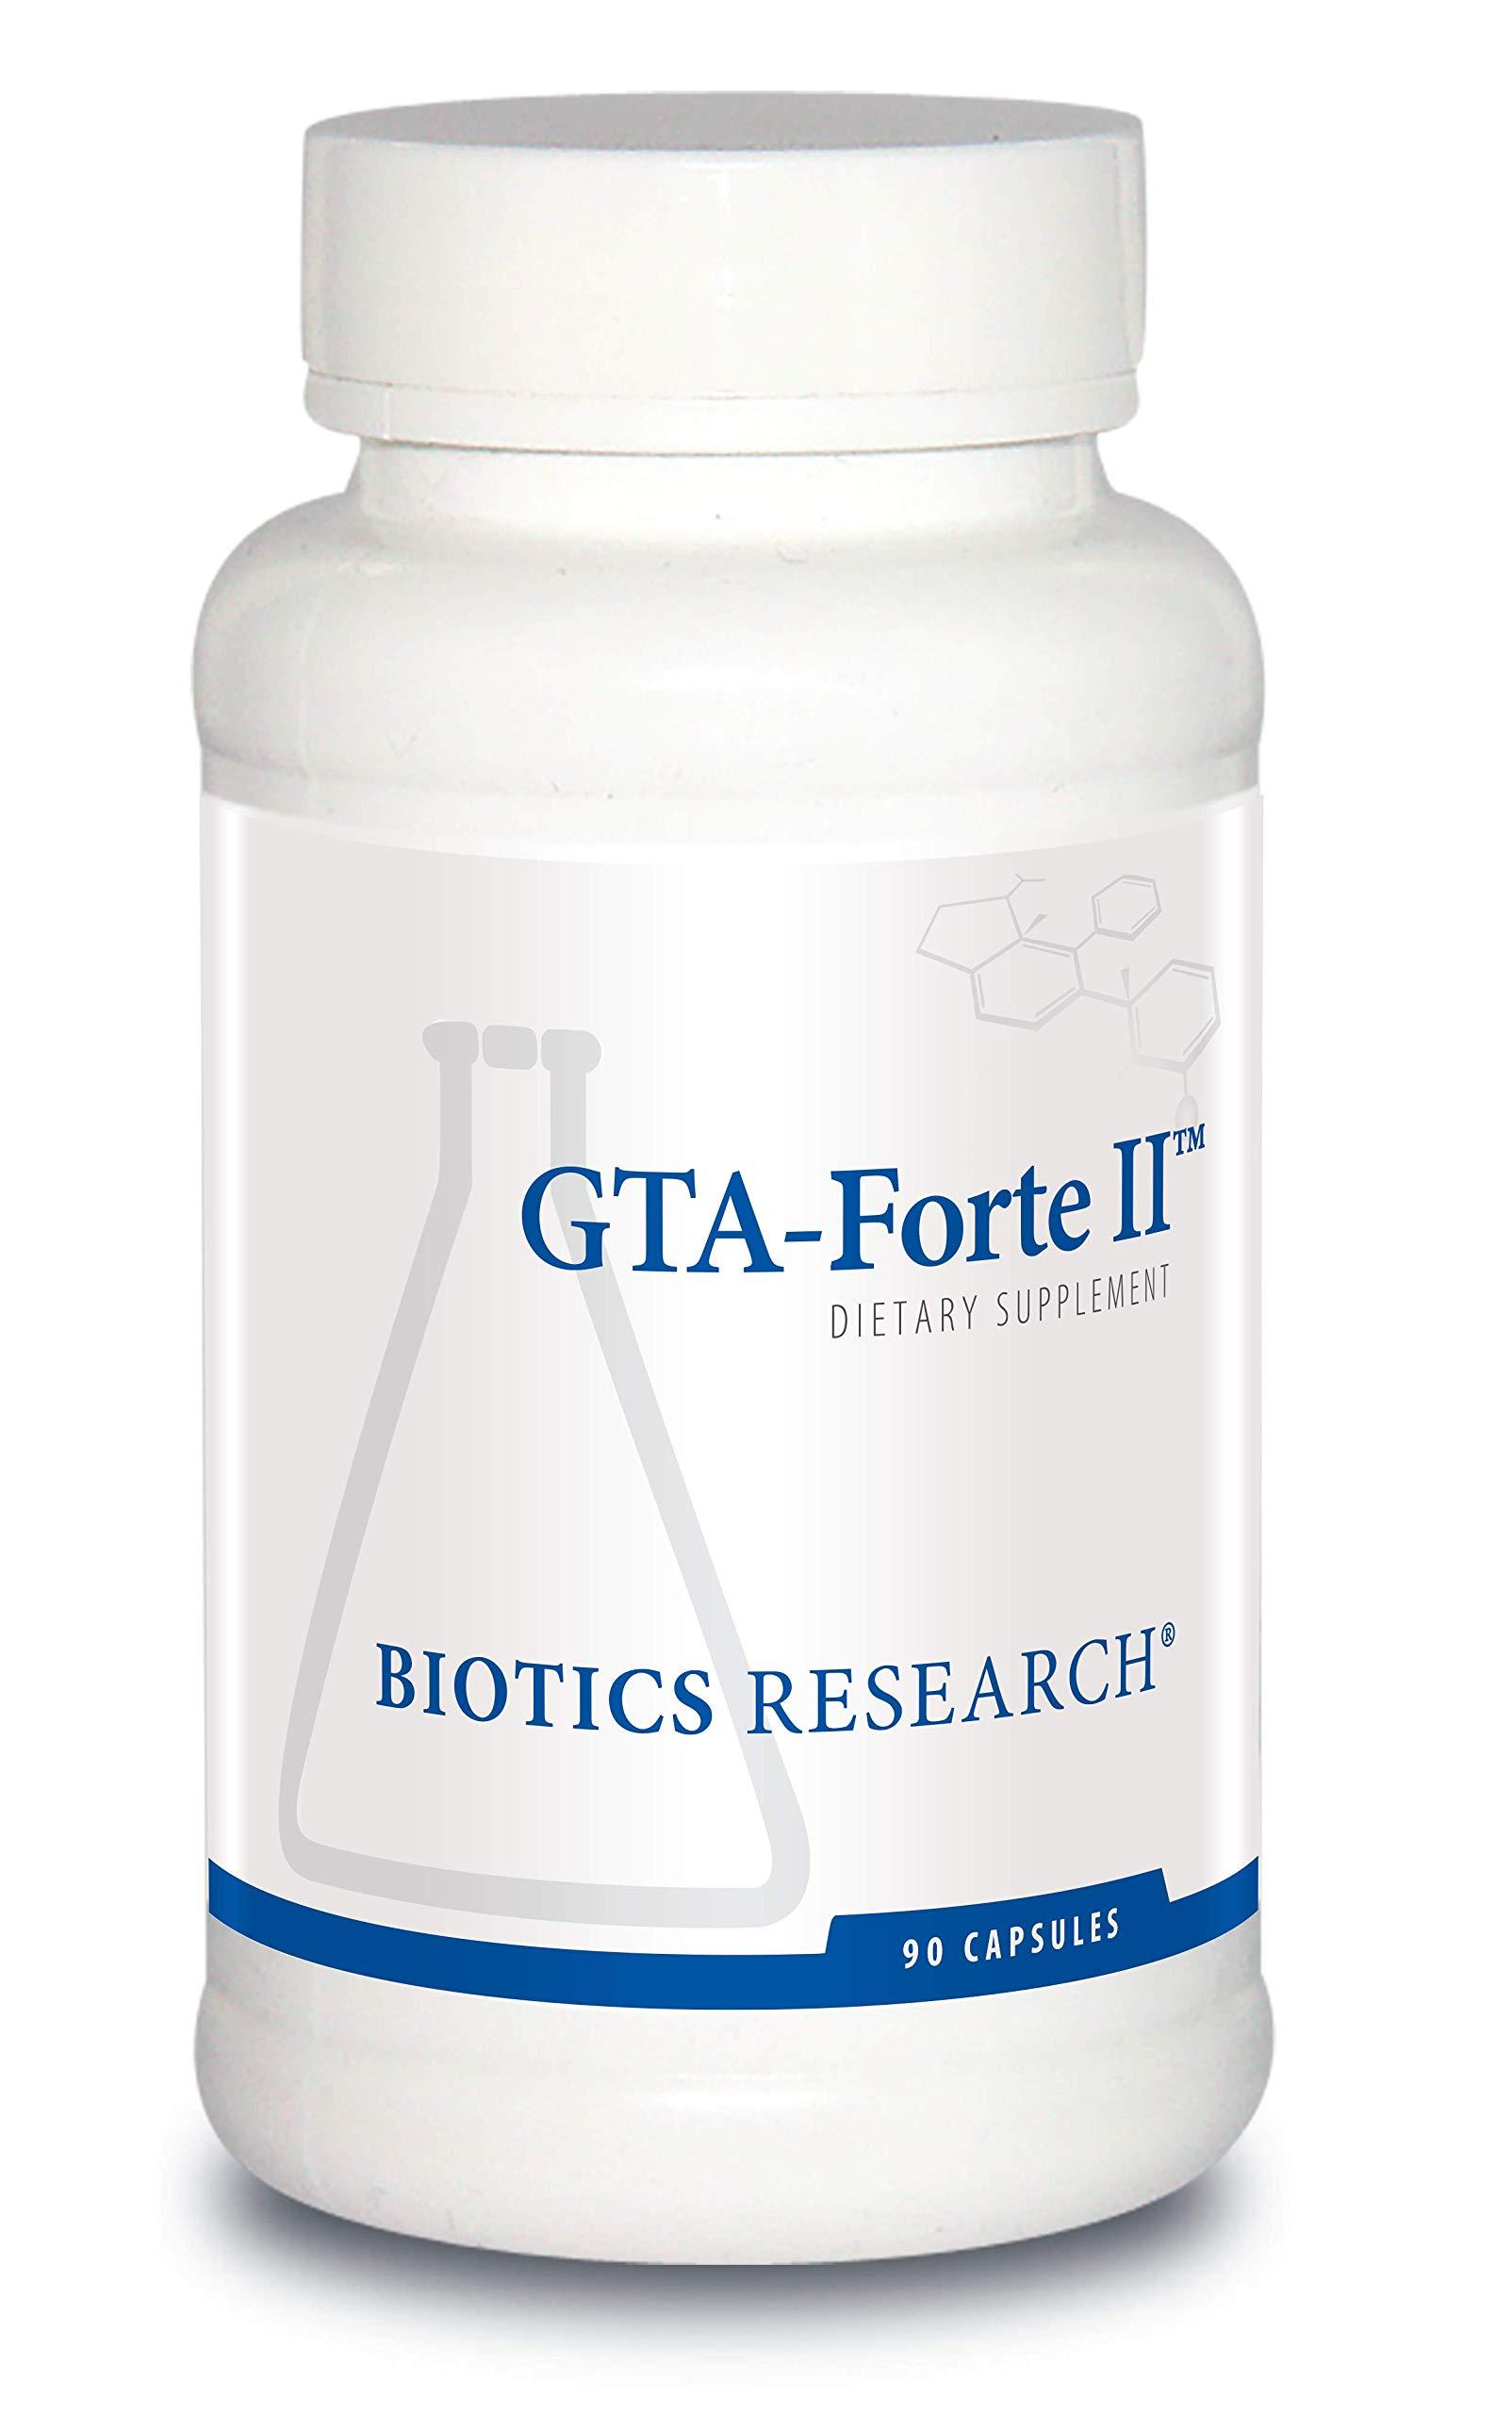 Biotics Research GTA Forte II Endocrine Glands Support, Promotes Optimal Hormonal Balance. Contains Porcine Glandular, Phytochemically Bound Trace Elements Zinc, Selenium, Copper, Rubidium 90 Caps